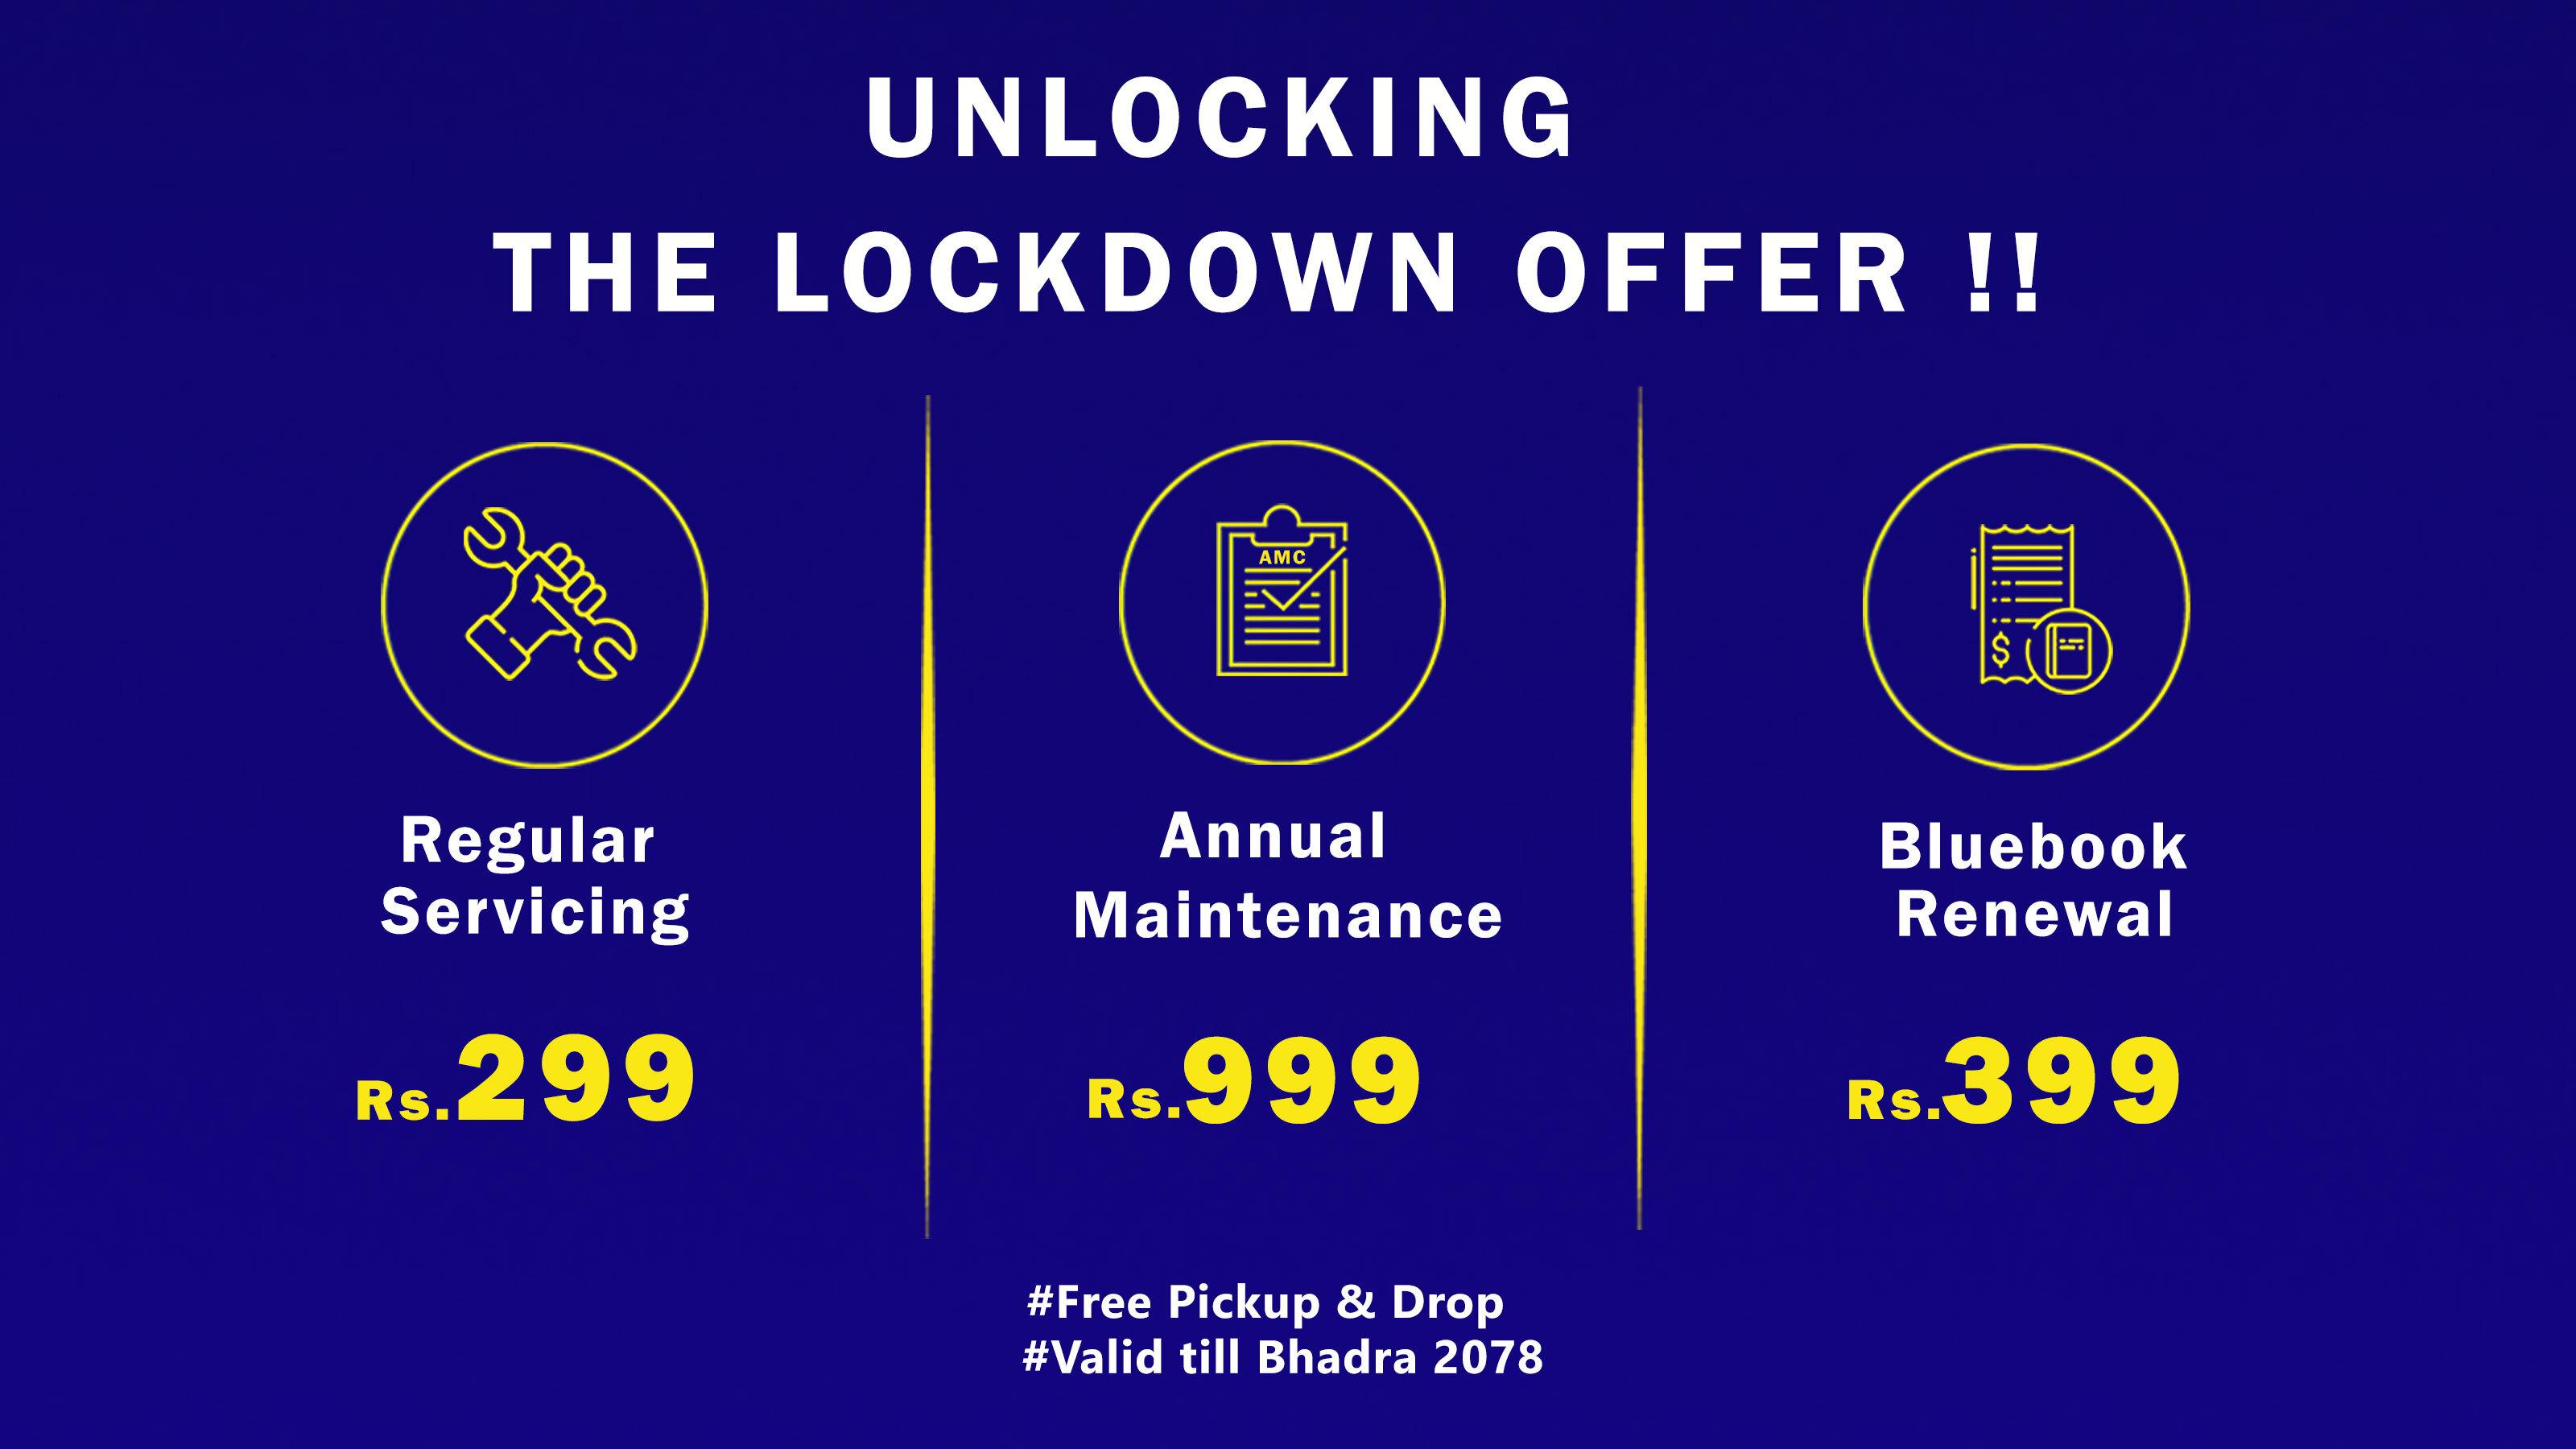 Unlock The Lockdown Offer!!